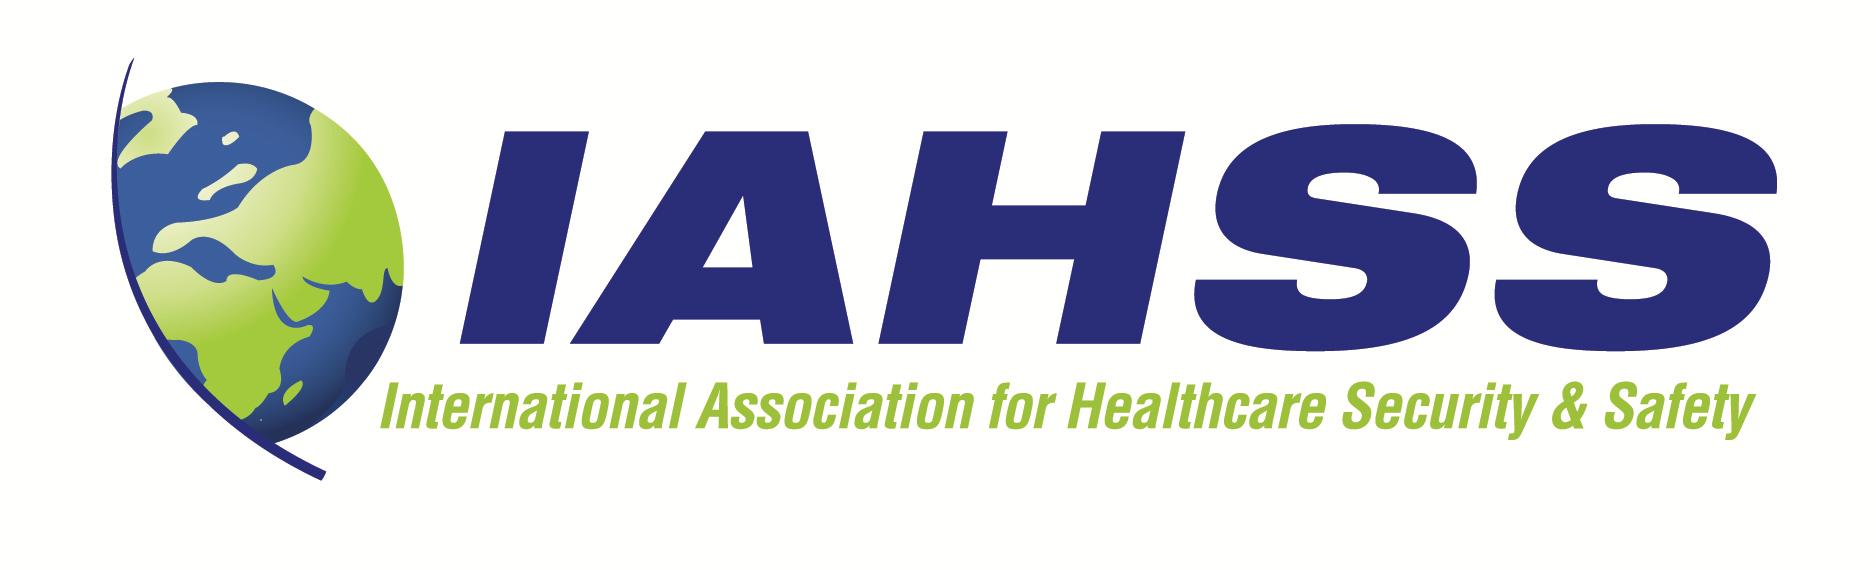 https://palamerican.com/wp-content/uploads/2021/06/New-IAHSS-Logo.png